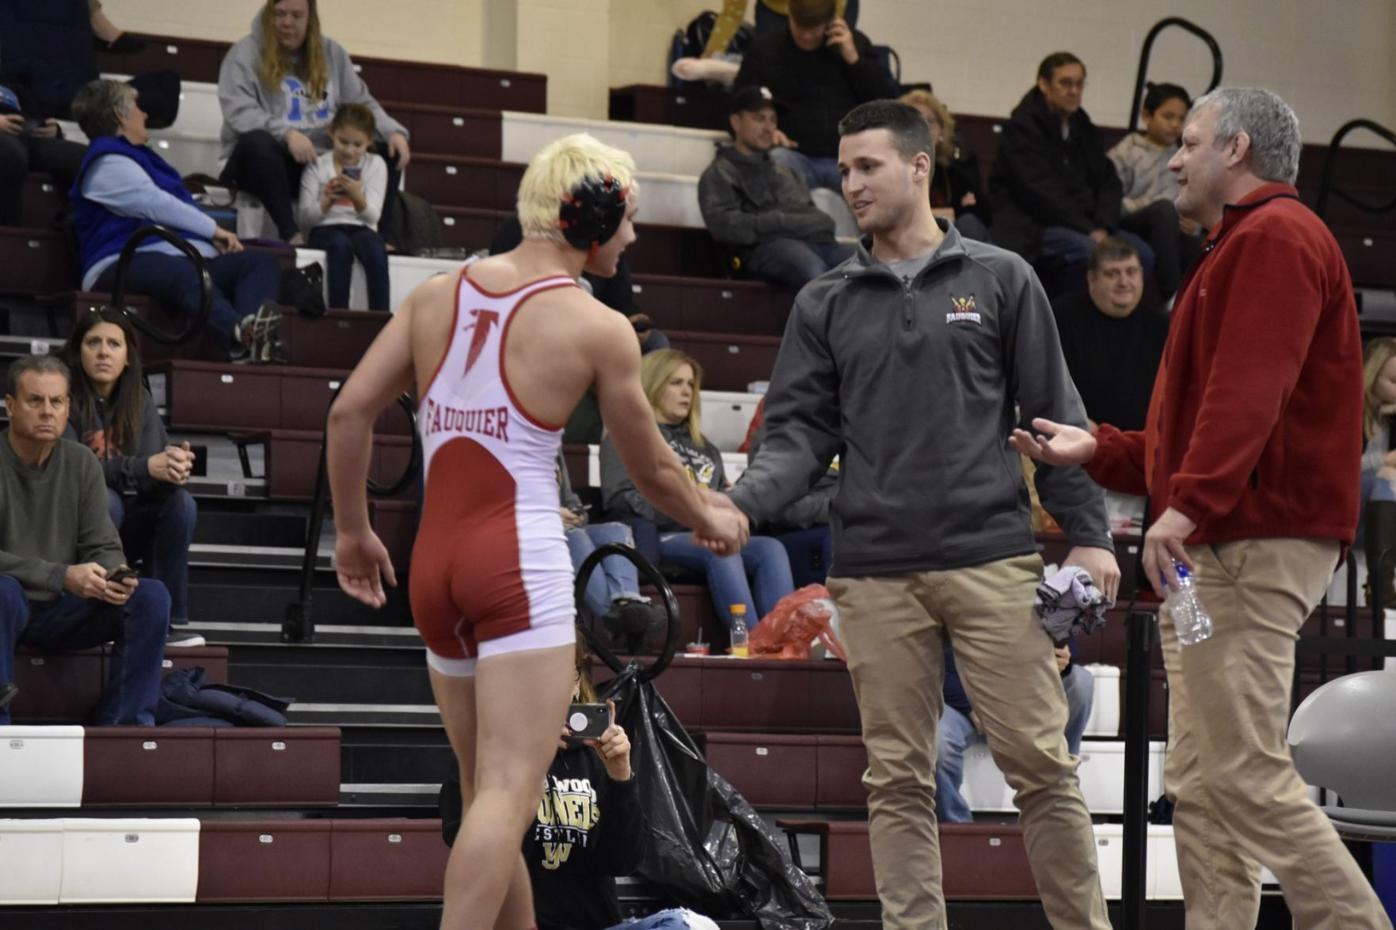 Hoffman head wrestling coach in Virginia